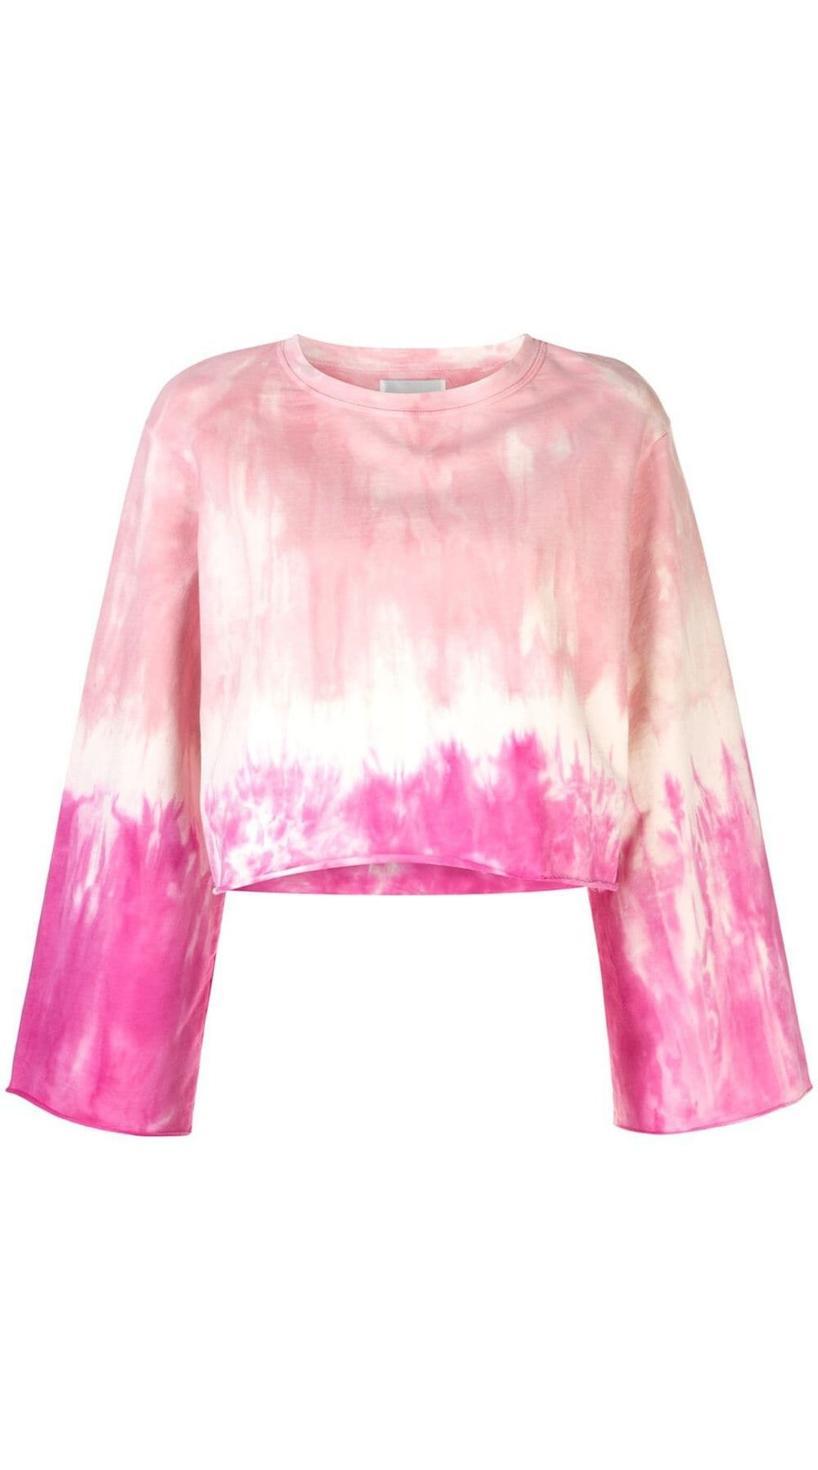 Tie Dye Trend, Tie Dye pieces, Tie Dye clothes, Tie Dye, Tie Dye fashion, Tie dye shirts, Tie dye pants, Tie dye sweaters, Tie dye phone cases, Tie dye bags